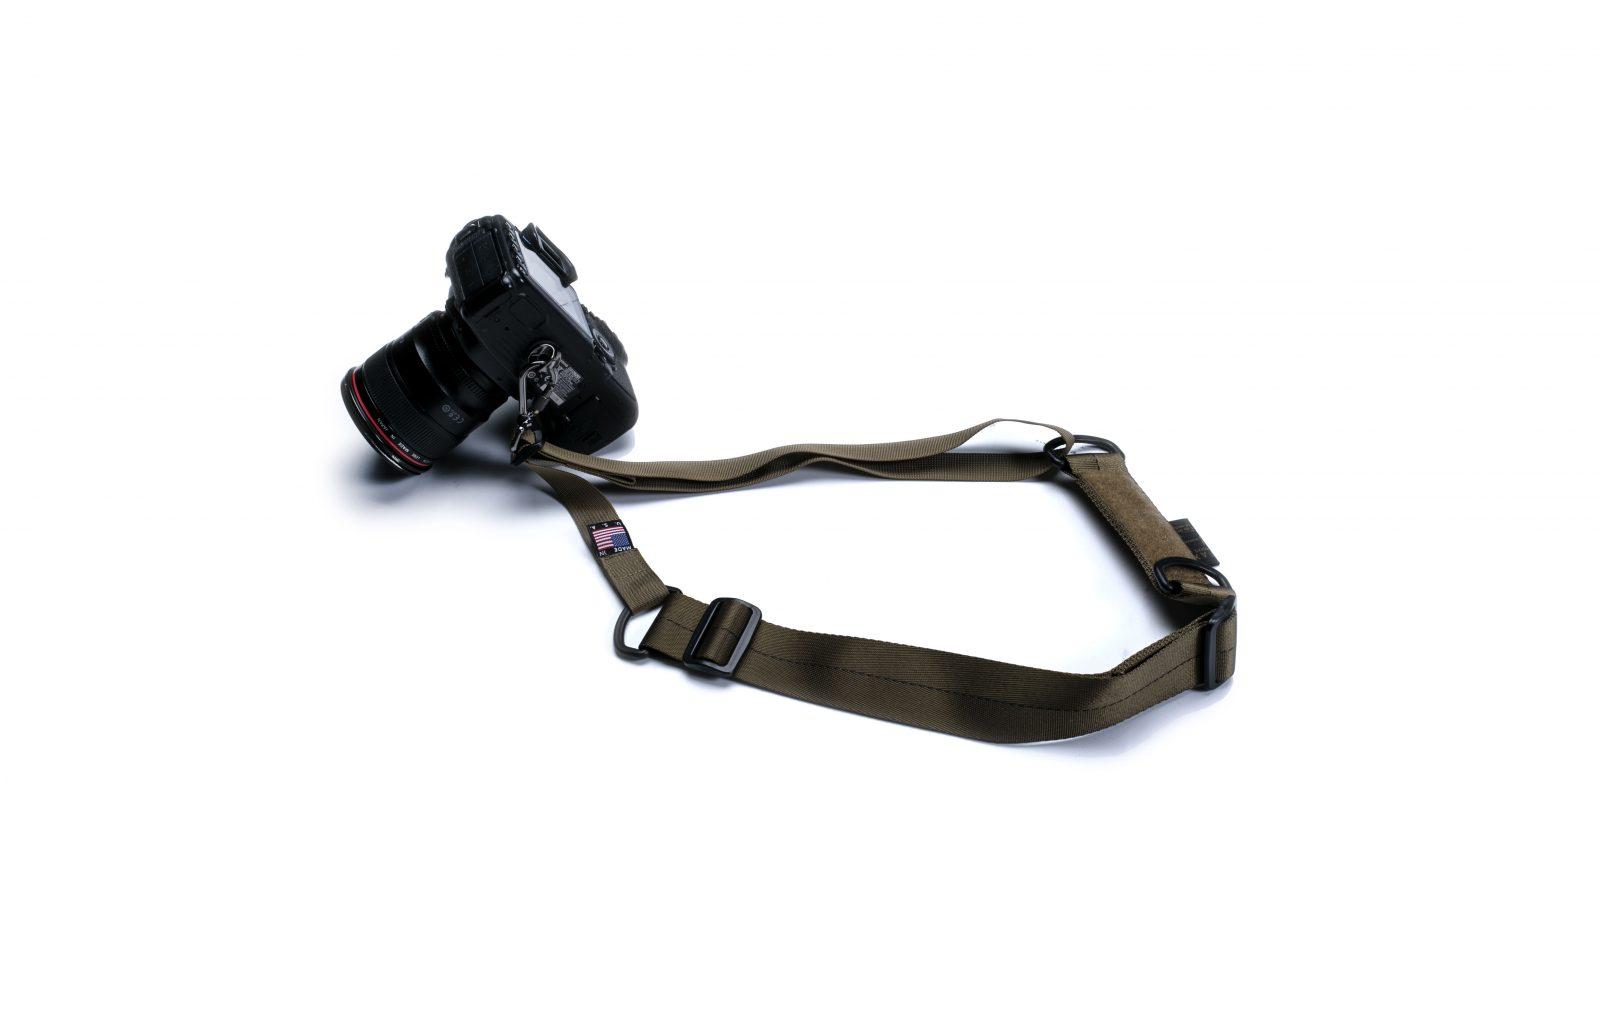 Camera Sling Strap 1600x1031 - Colfax Design Works Camera Sling Strap